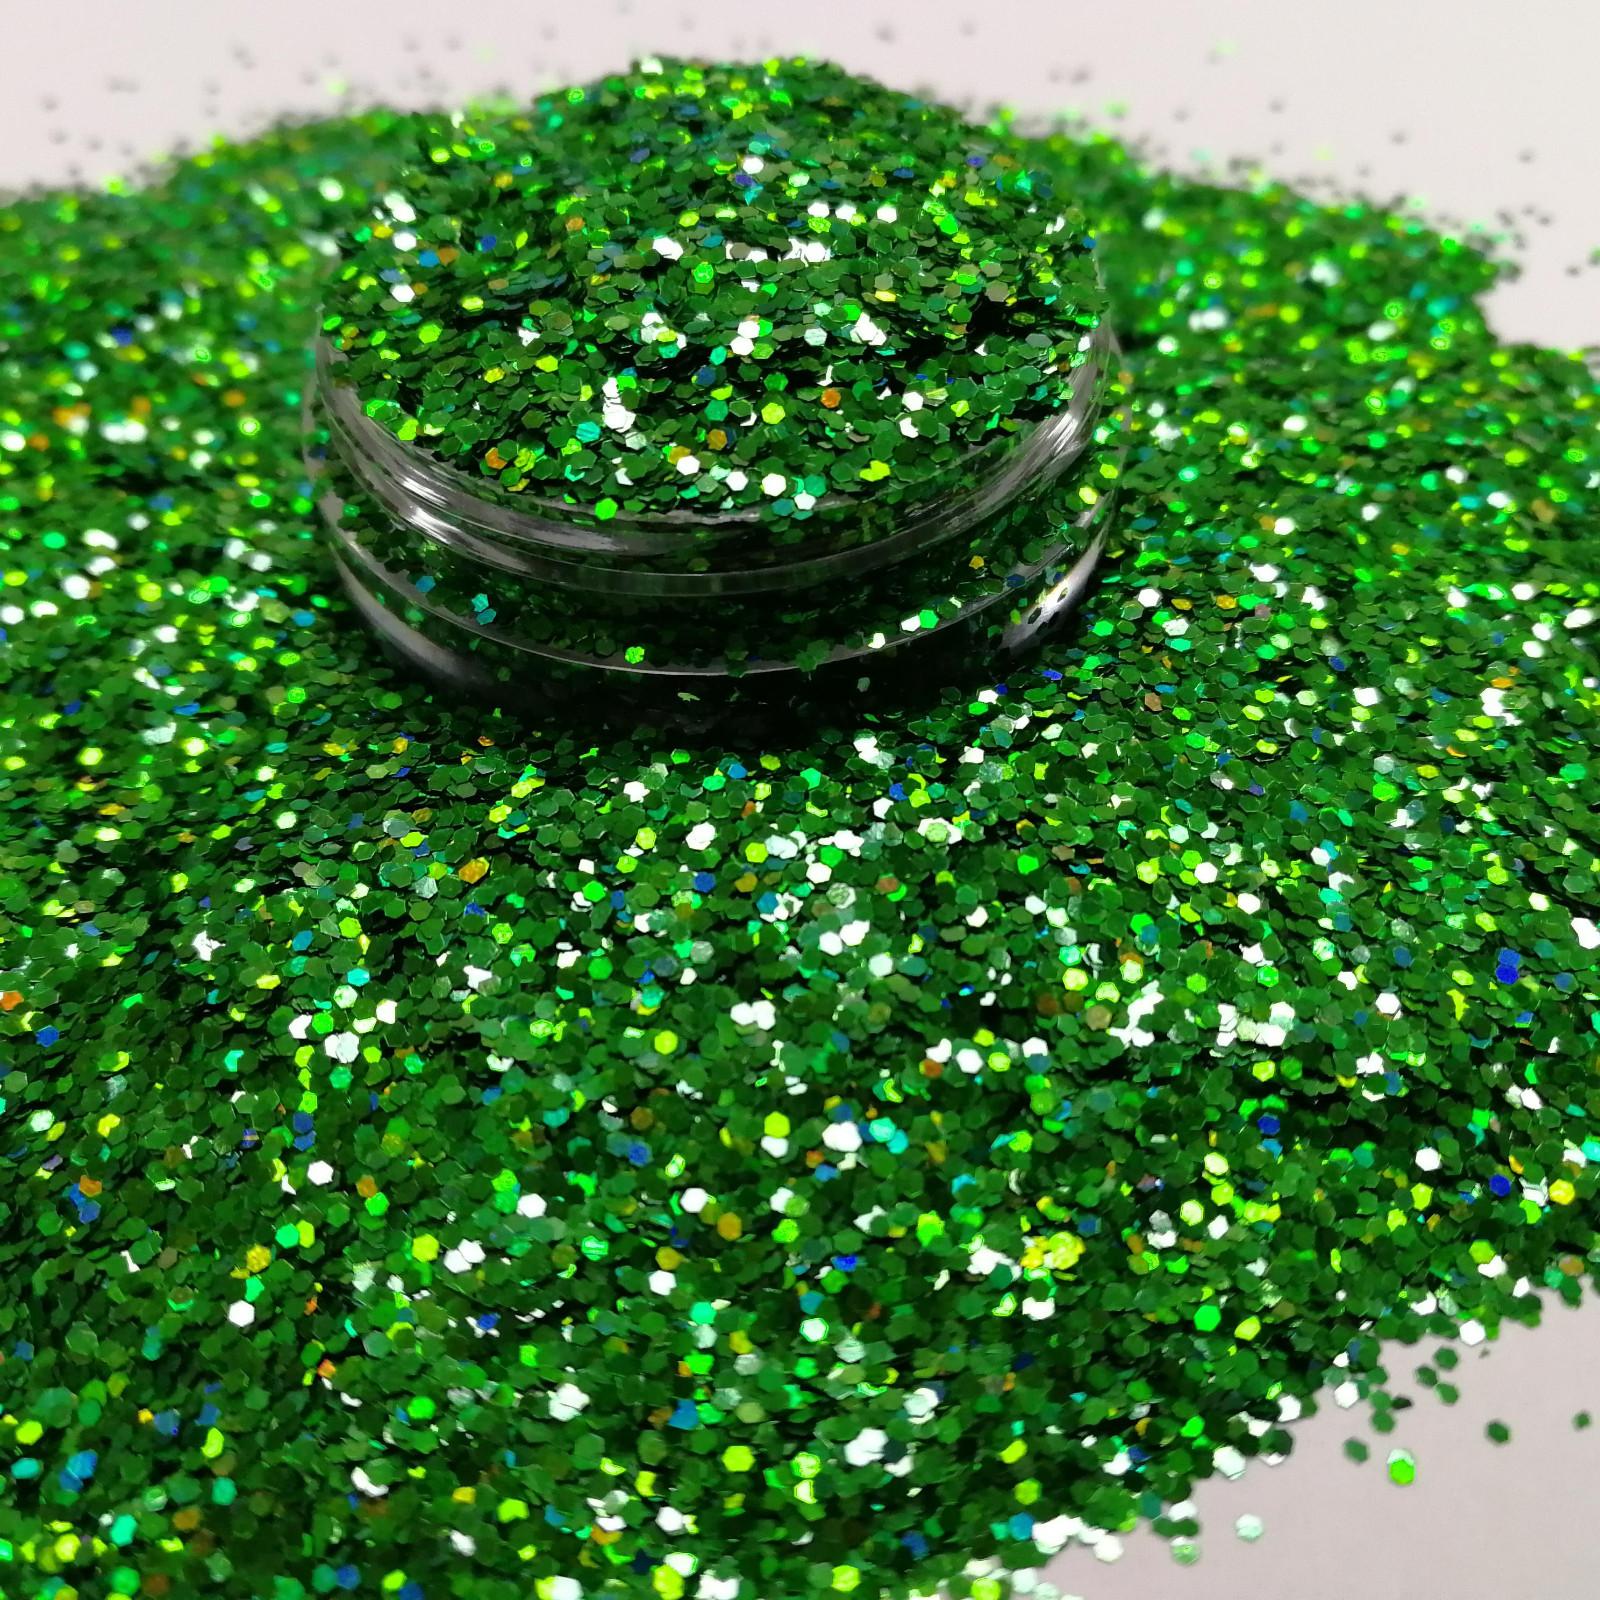 XUCAI-Find Supply New Sparkle 1mm Festival Glitter Powder For Body-5